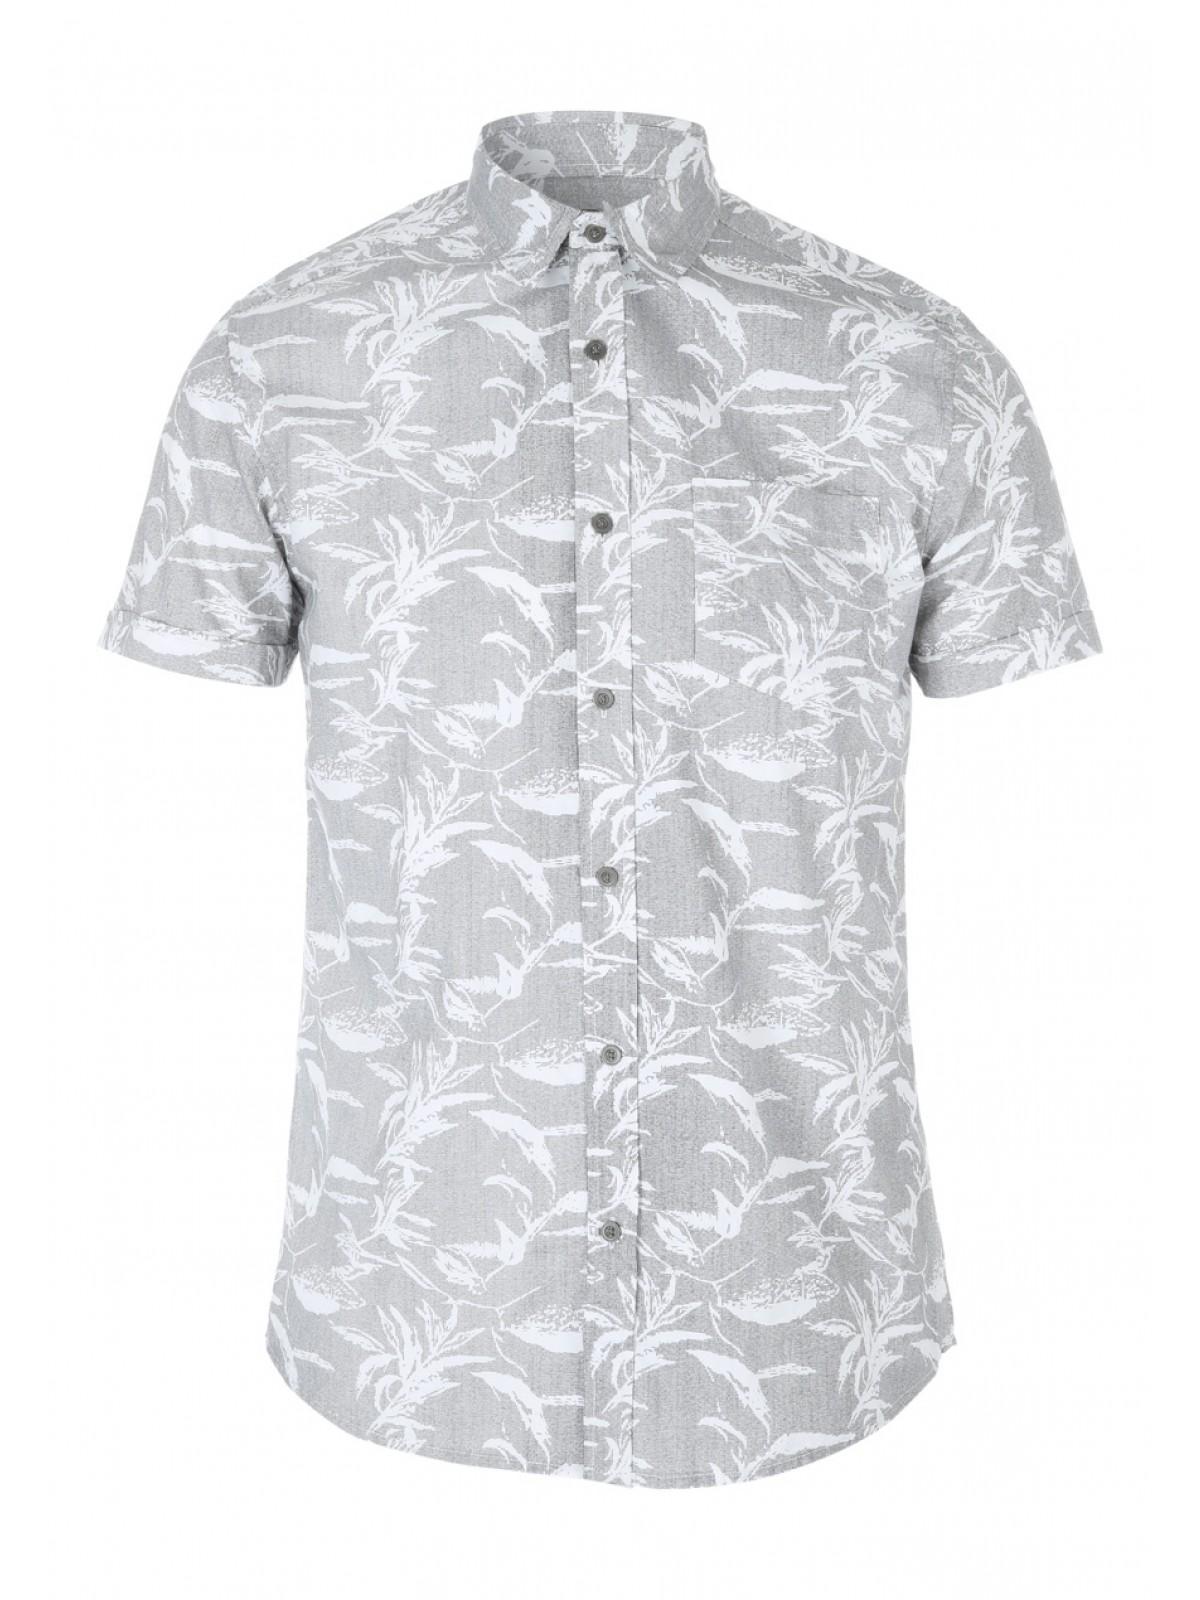 361d83368a05 Home; Mens Textured Floral Short Sleeve Shirt. Back. PreviousNext